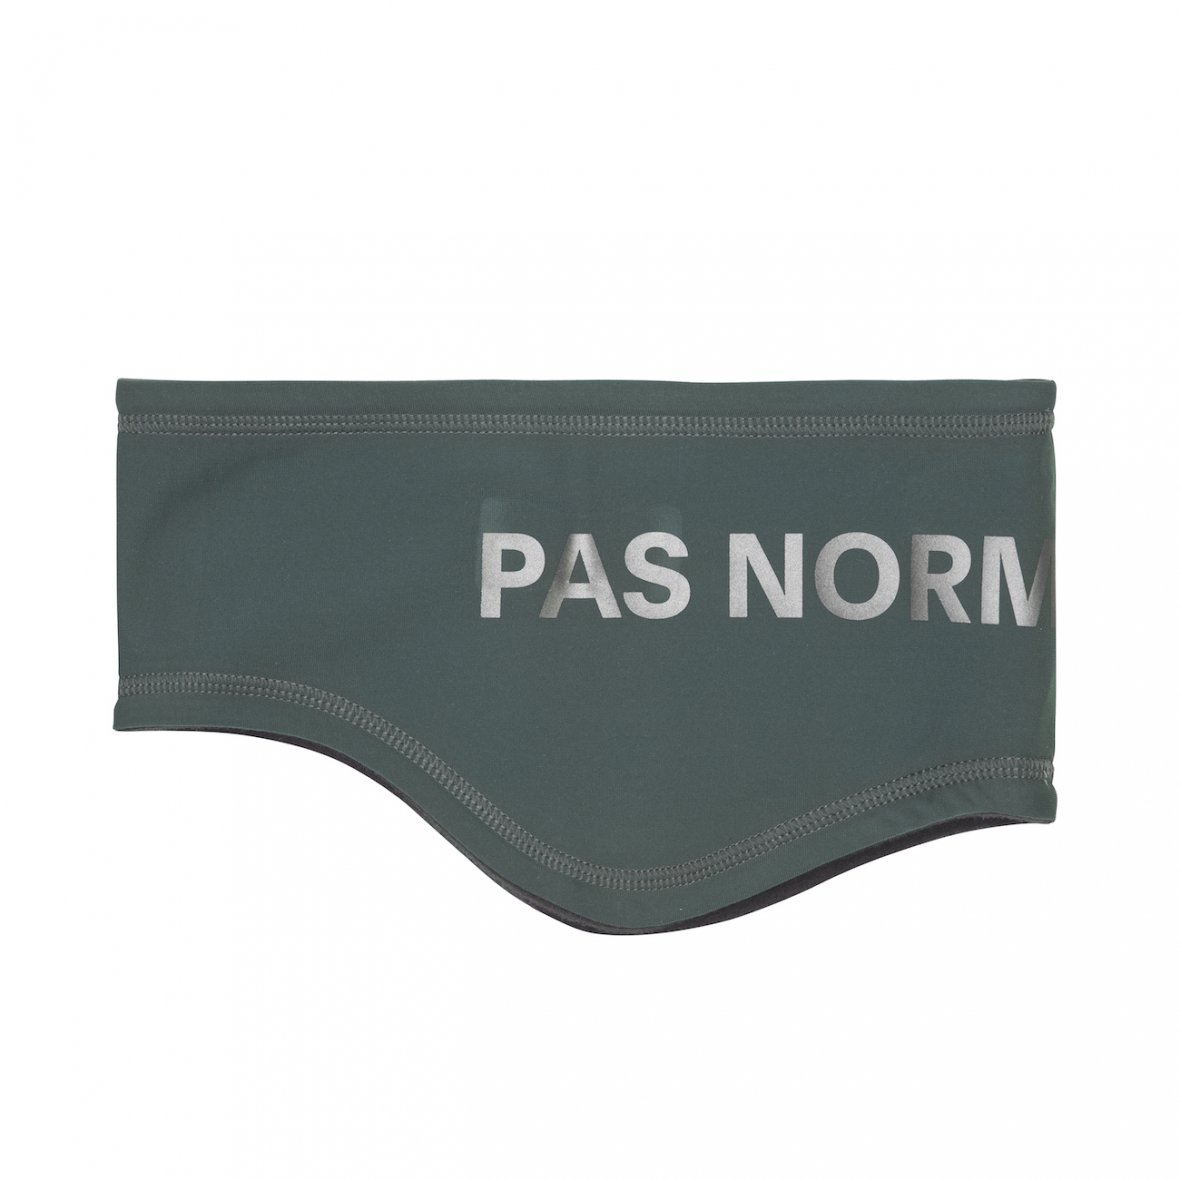 Pas Normal Studios Control Headband - Dark Green